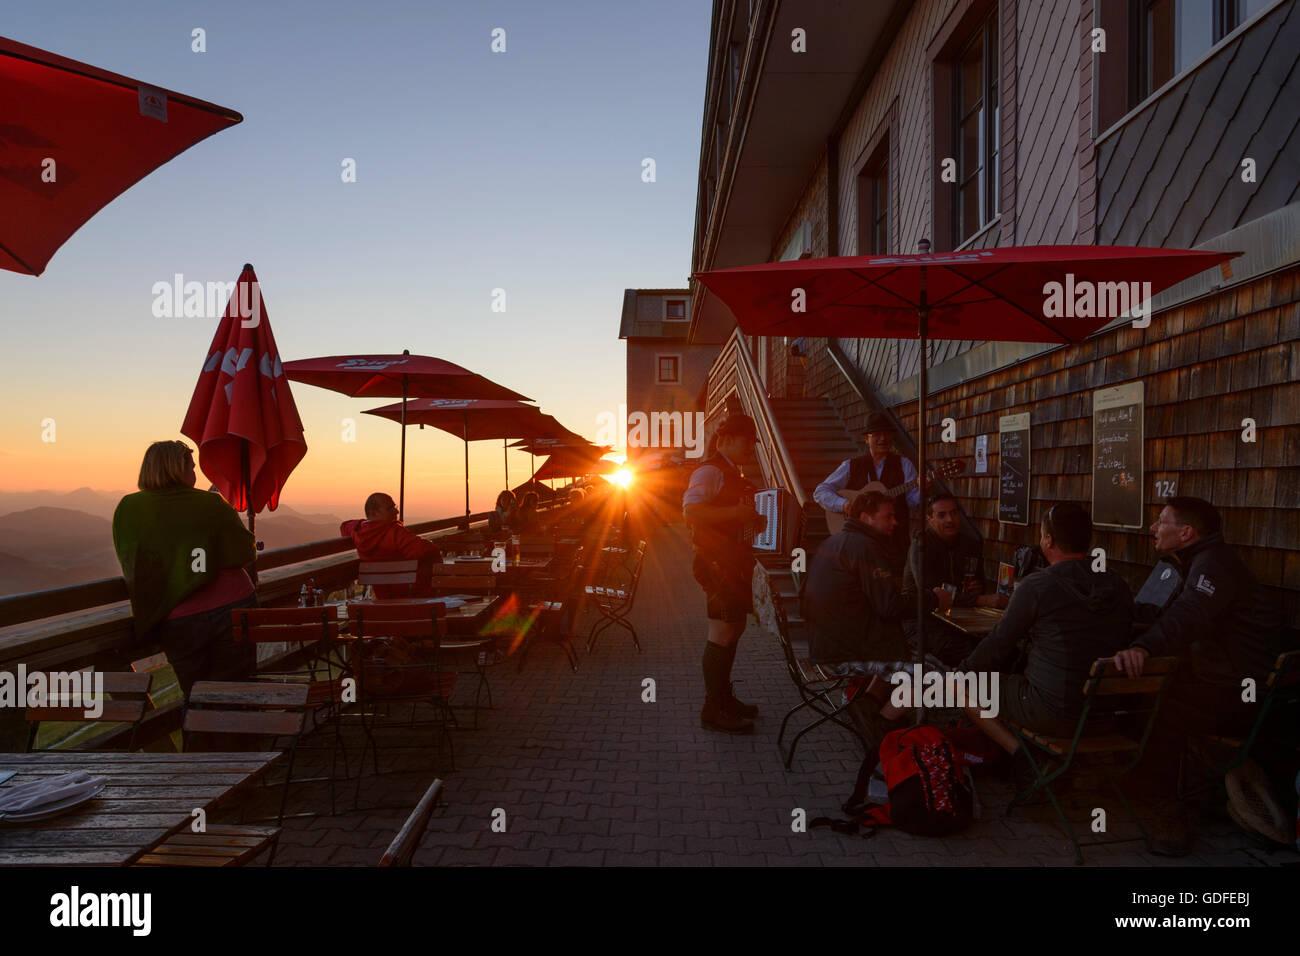 Sankt Gilgen: Accordion player and guests of Schafberghotel at sunset, Austria, Salzburg, Salzkammergut - Stock Image